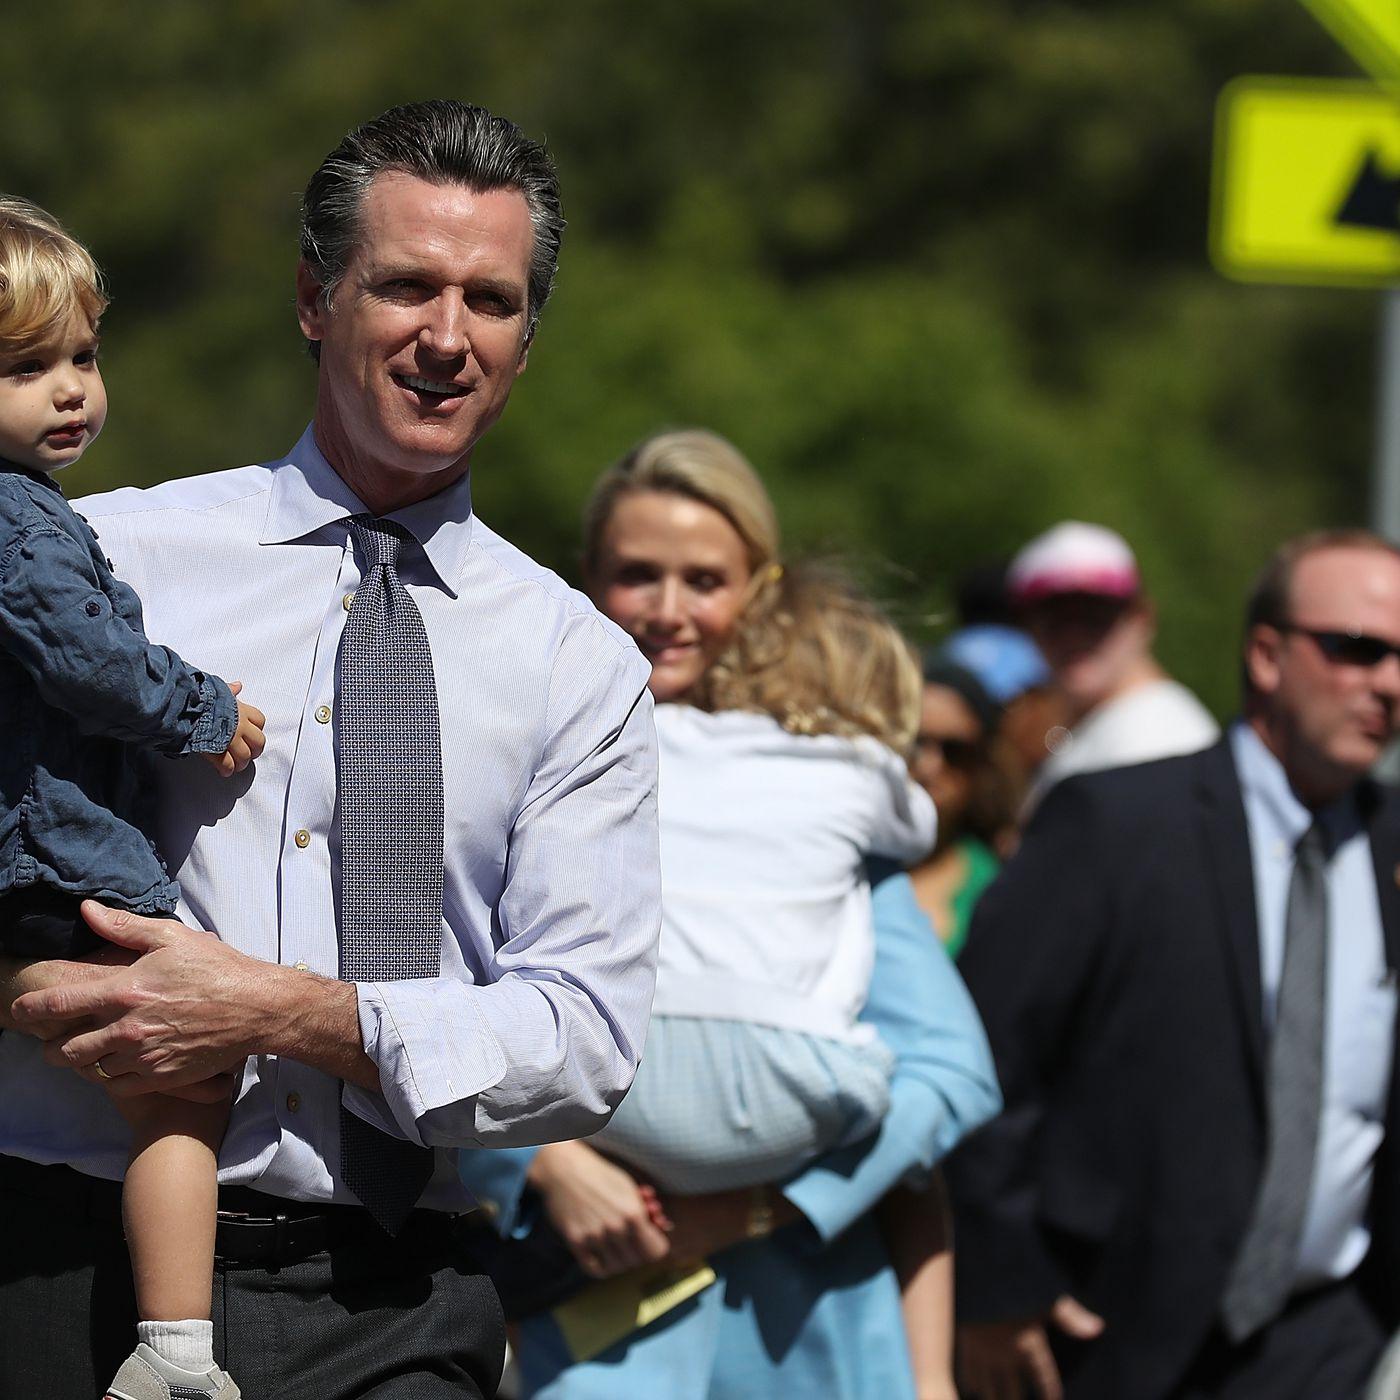 vox.com - Dylan Matthews - Gavin Newsom's ambitious plan to cut poverty in California